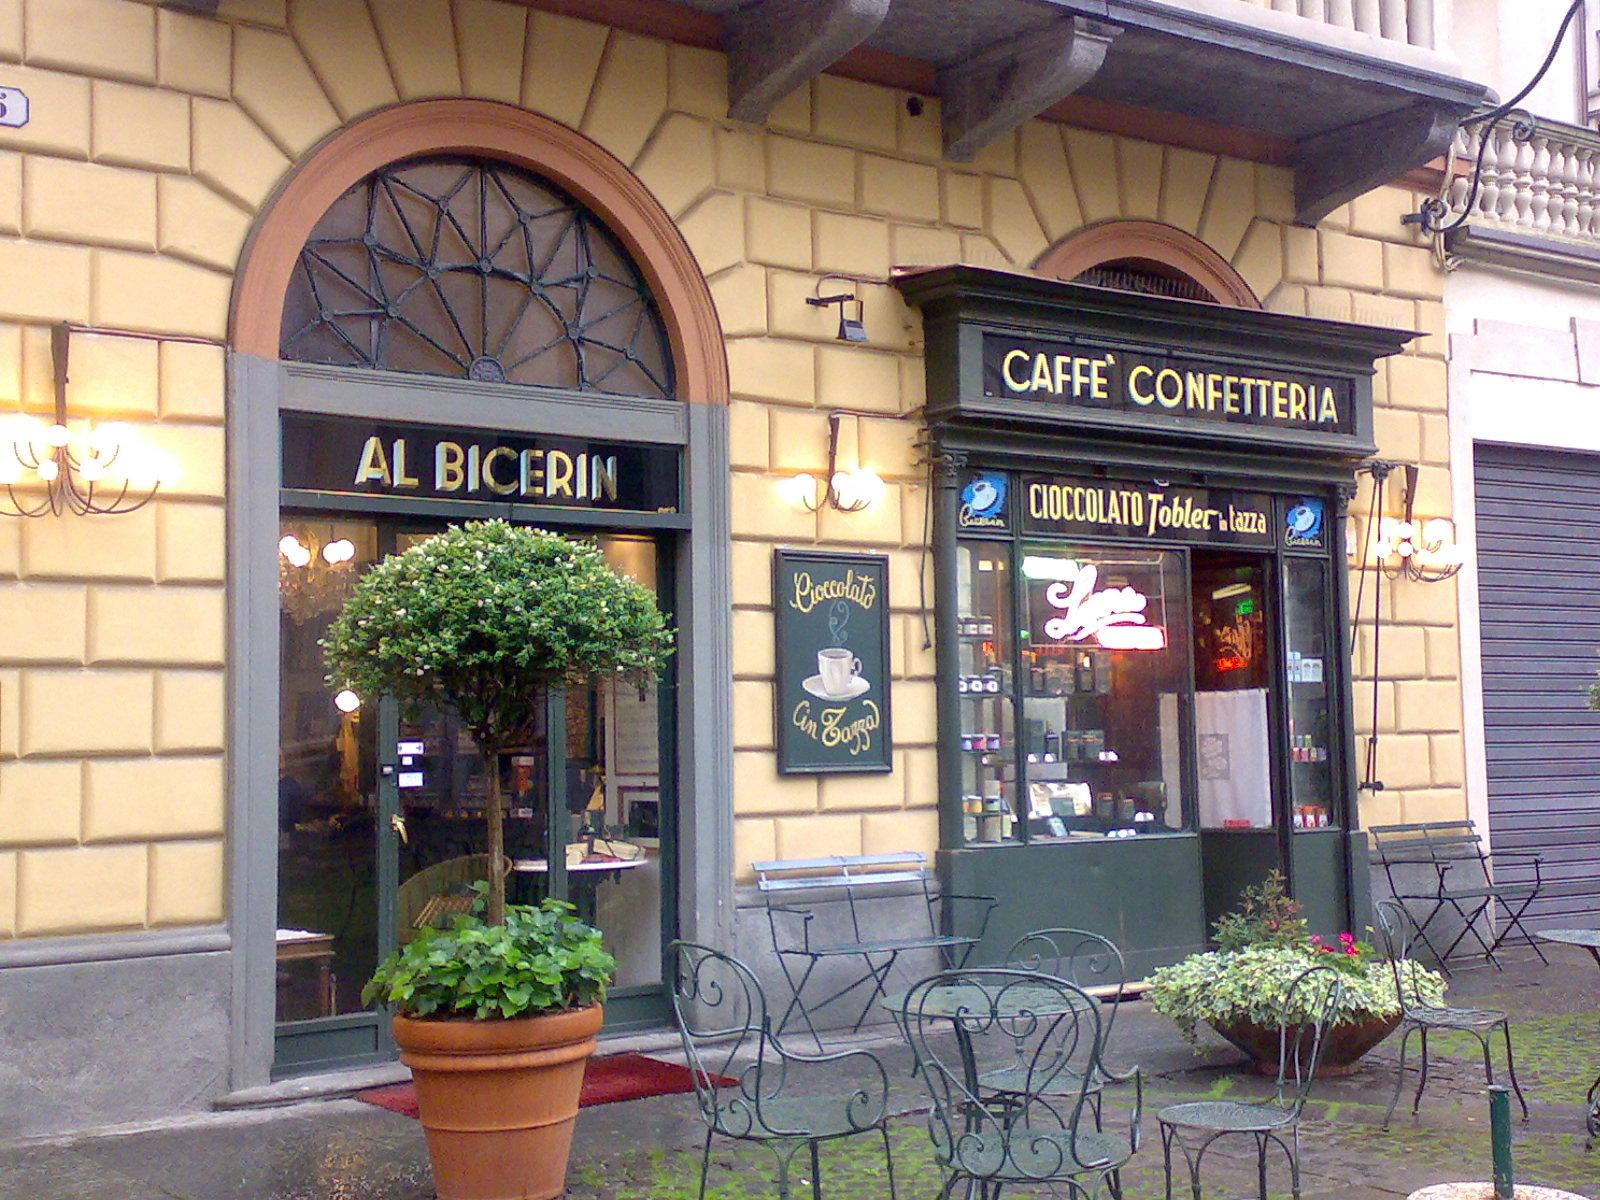 Paese che vai leggenda che trovi caff al bicerin bar for Bar maison torino